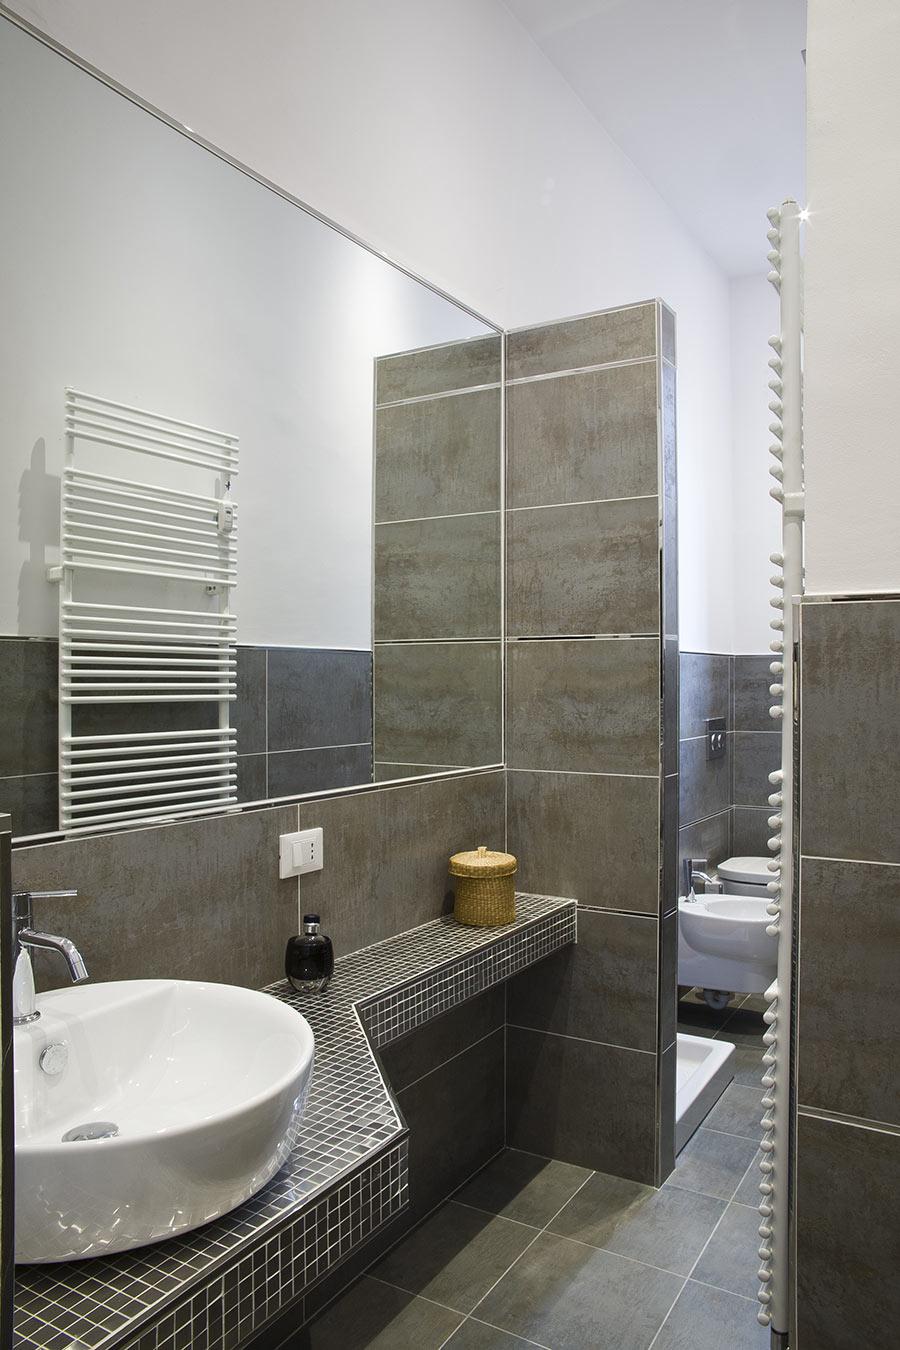 Arredo Bagno In Muratura Moderno.Bagni In Muratura 20 Idee Moderne Per Un Bagno Di Carattere